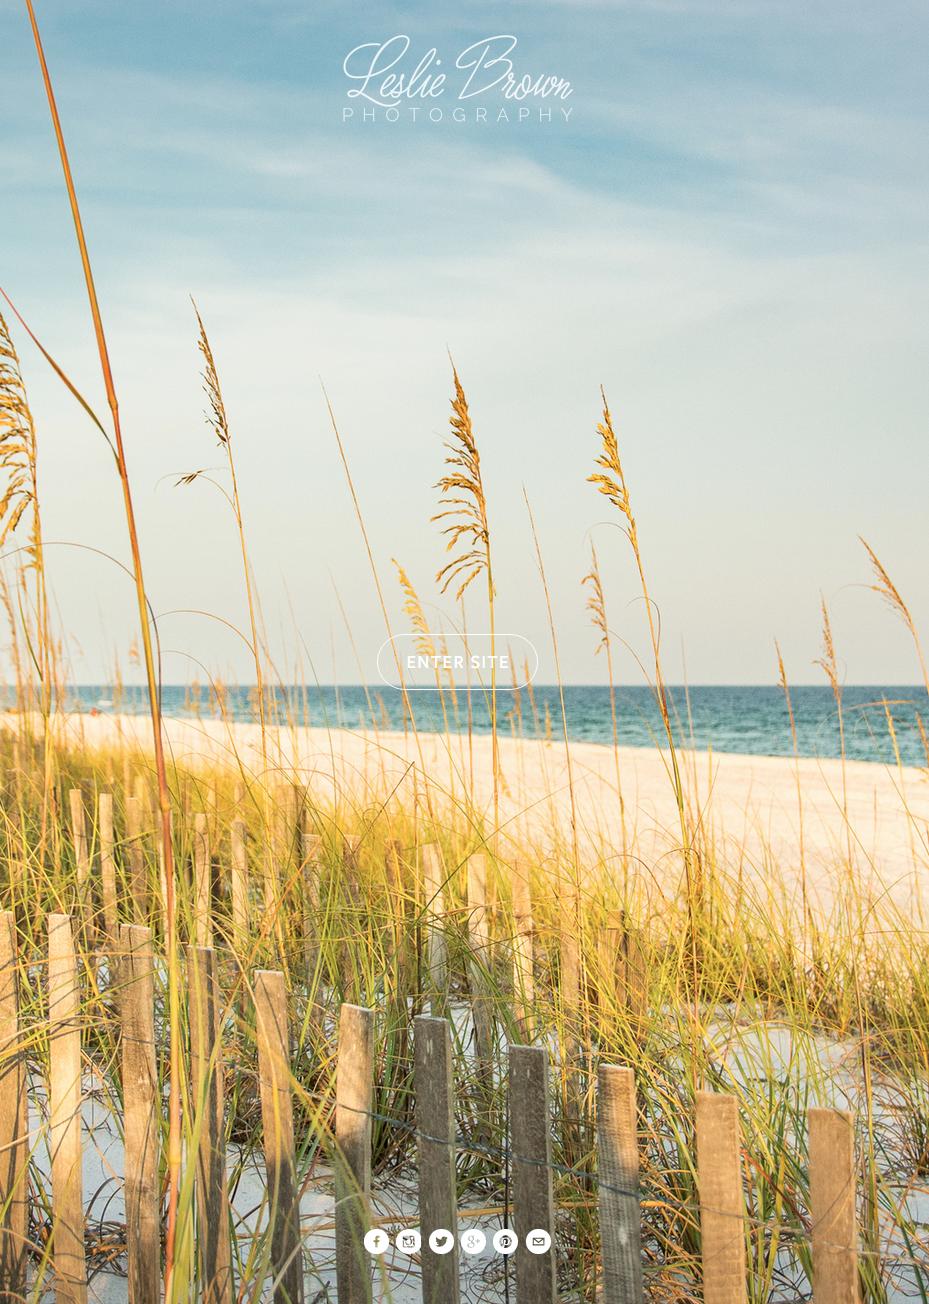 Lazy Beachy Day - Leslie Brown